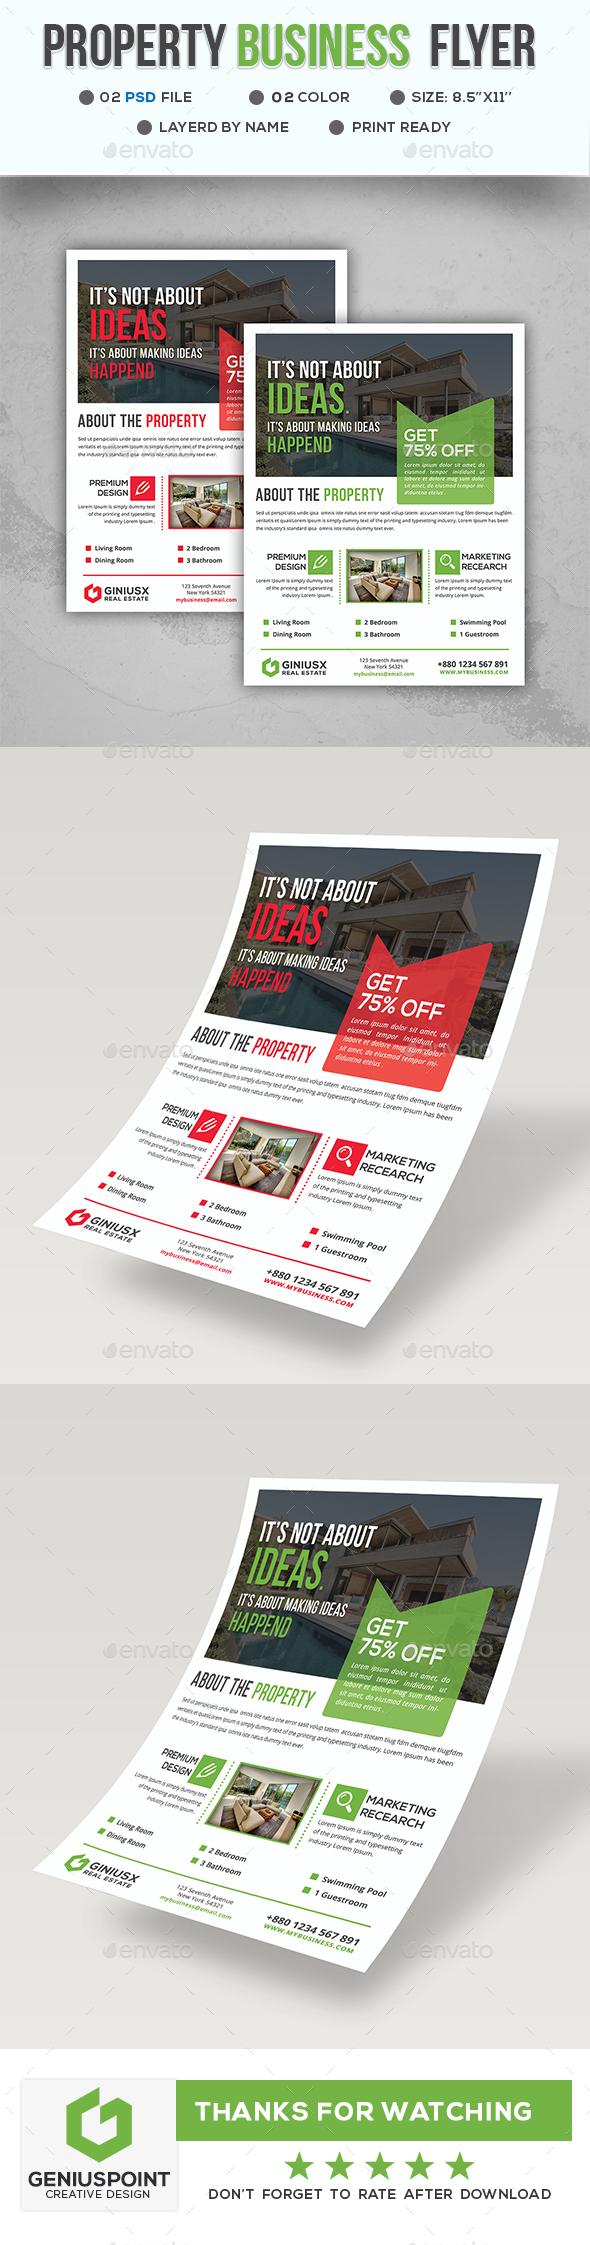 Property Business Flyer - Flyers Print Templates